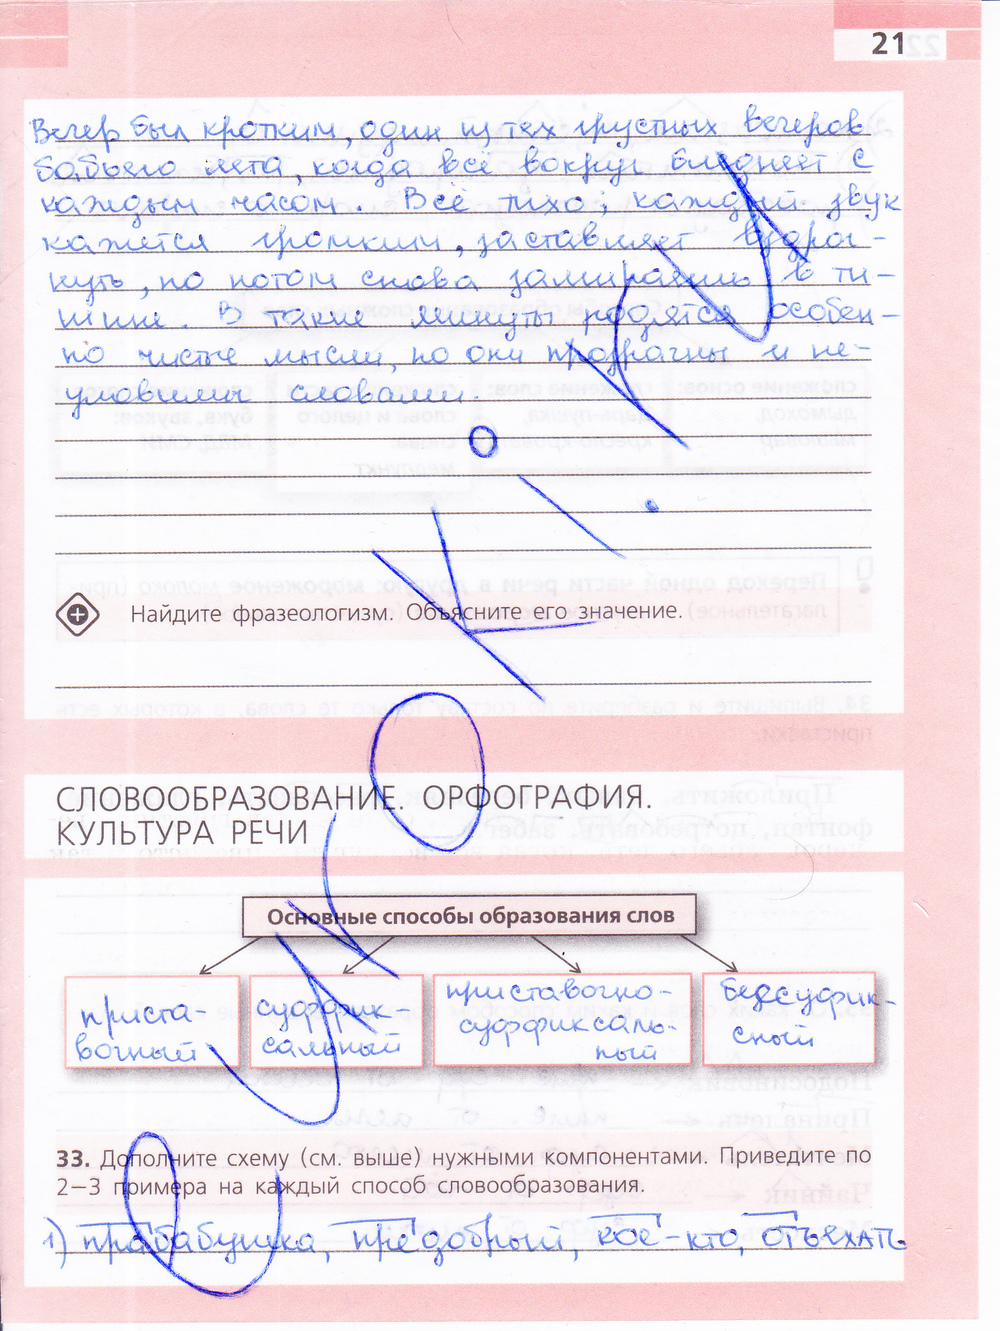 класс 6 гдз ефремова по русскому